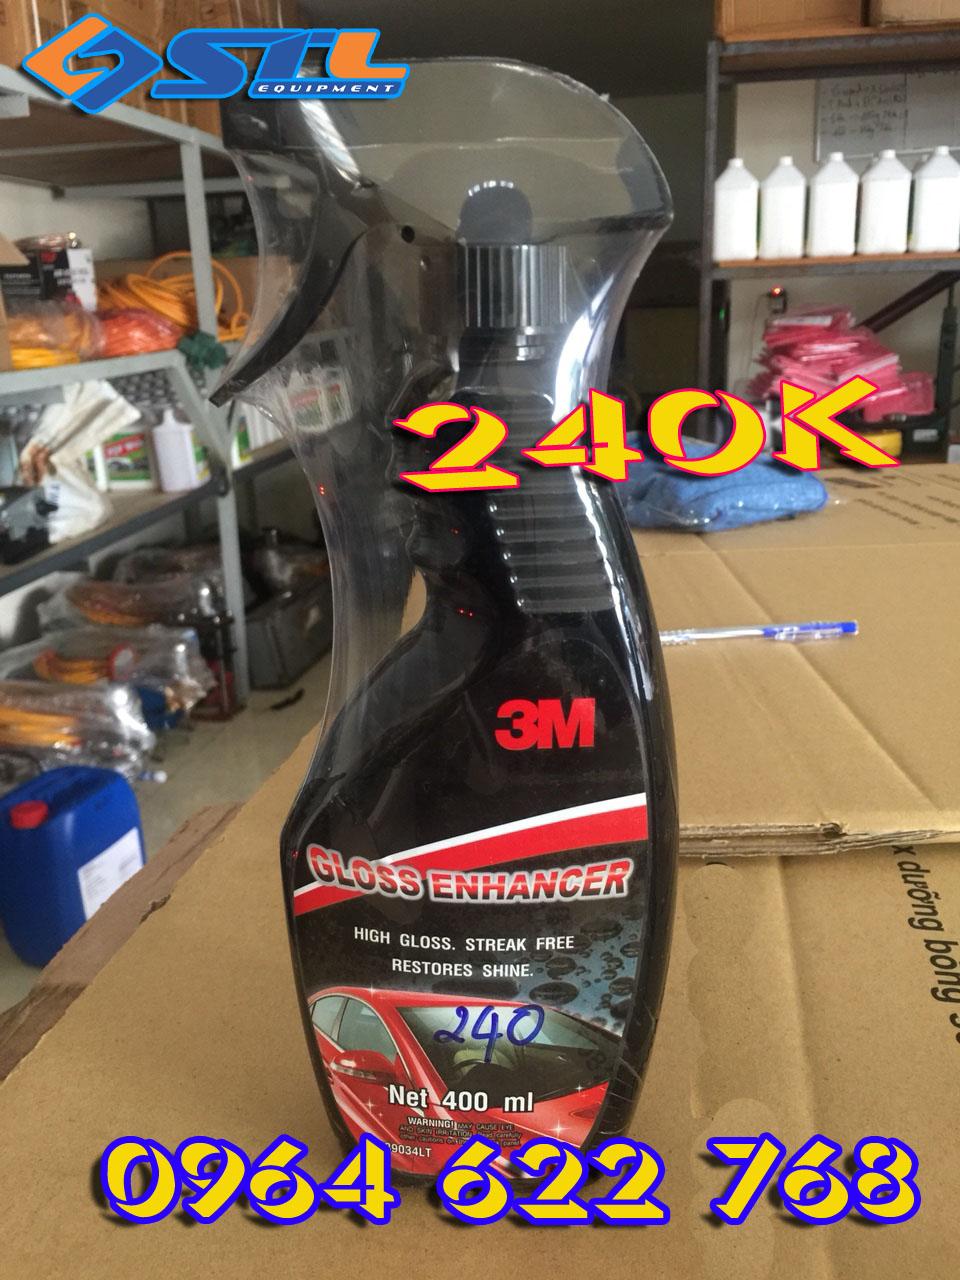 Chai xit danh bong nhanh 3M Gloss Enhancer 39034LT 400ml